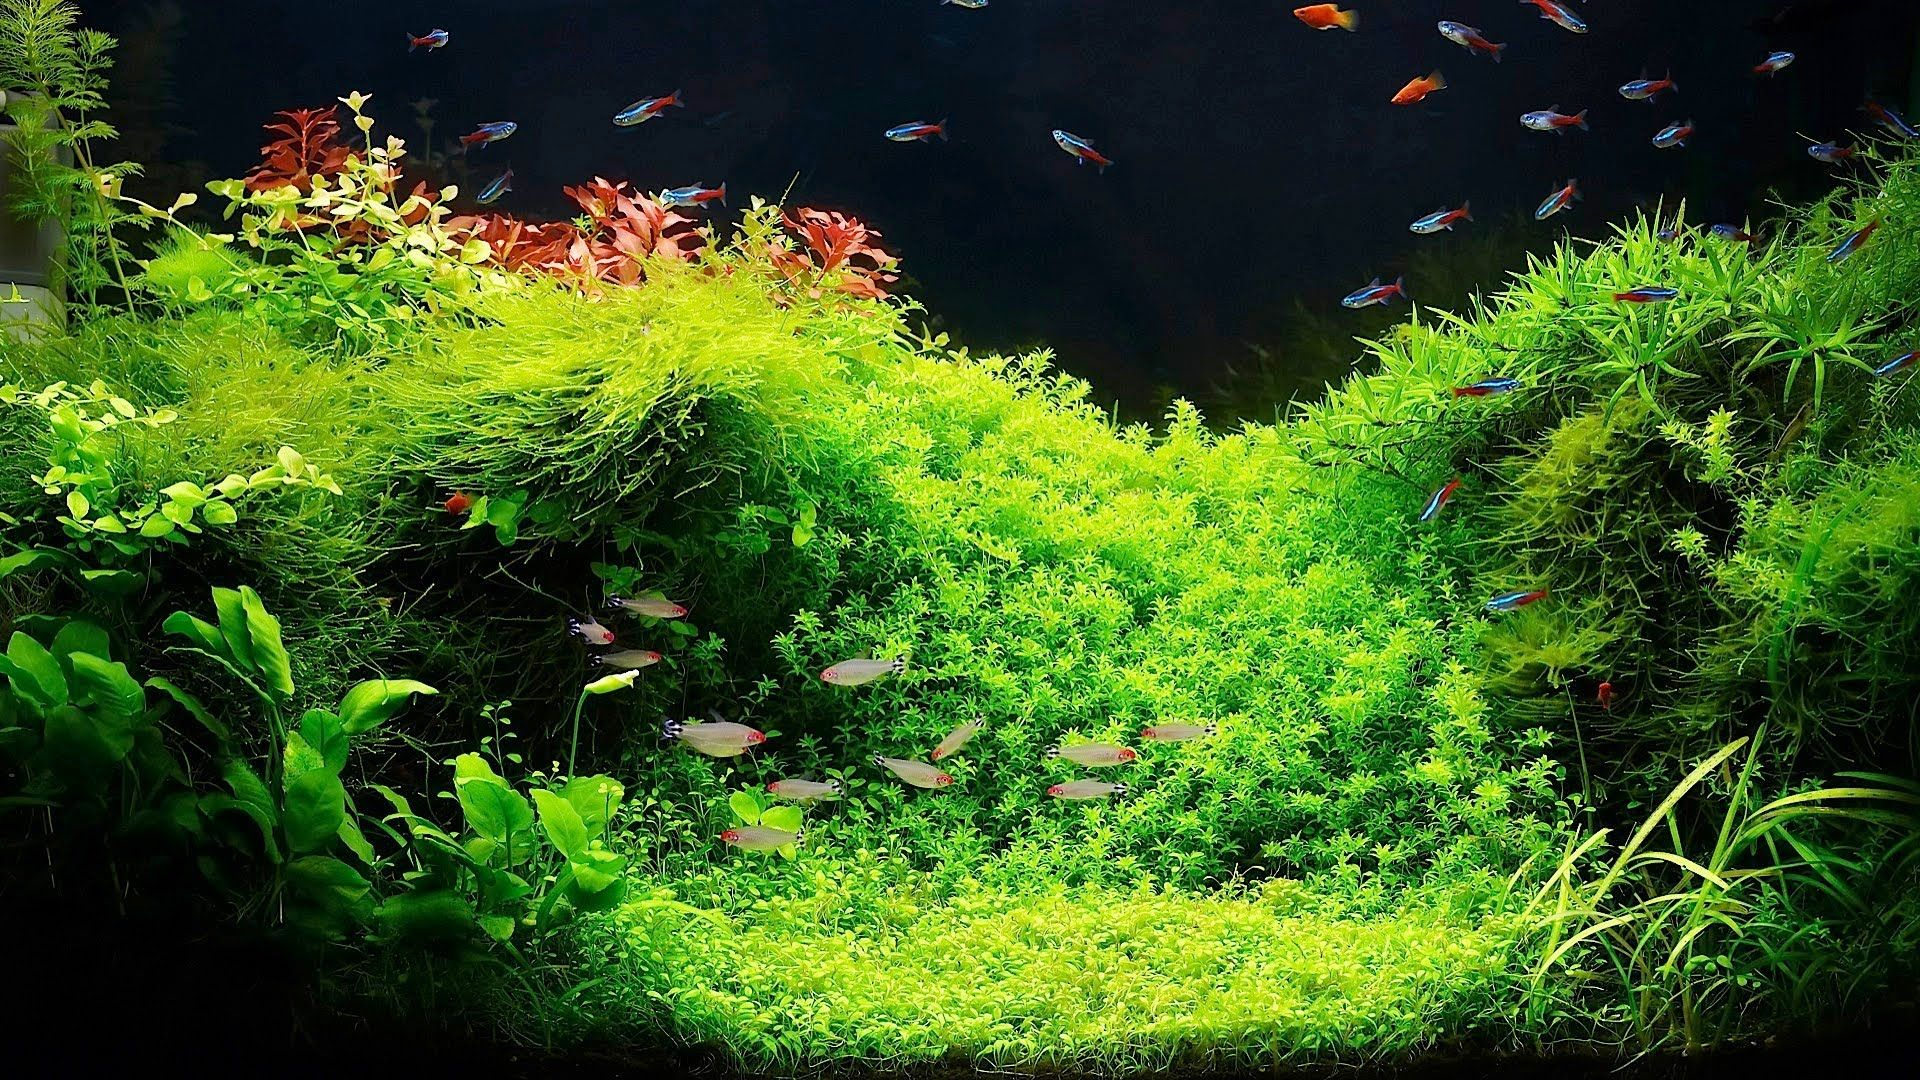 Setting Up A Fish Tank With Live Plants Aquarium Care Planted Aquarium Live Aquarium Plants Freshwater Aquarium